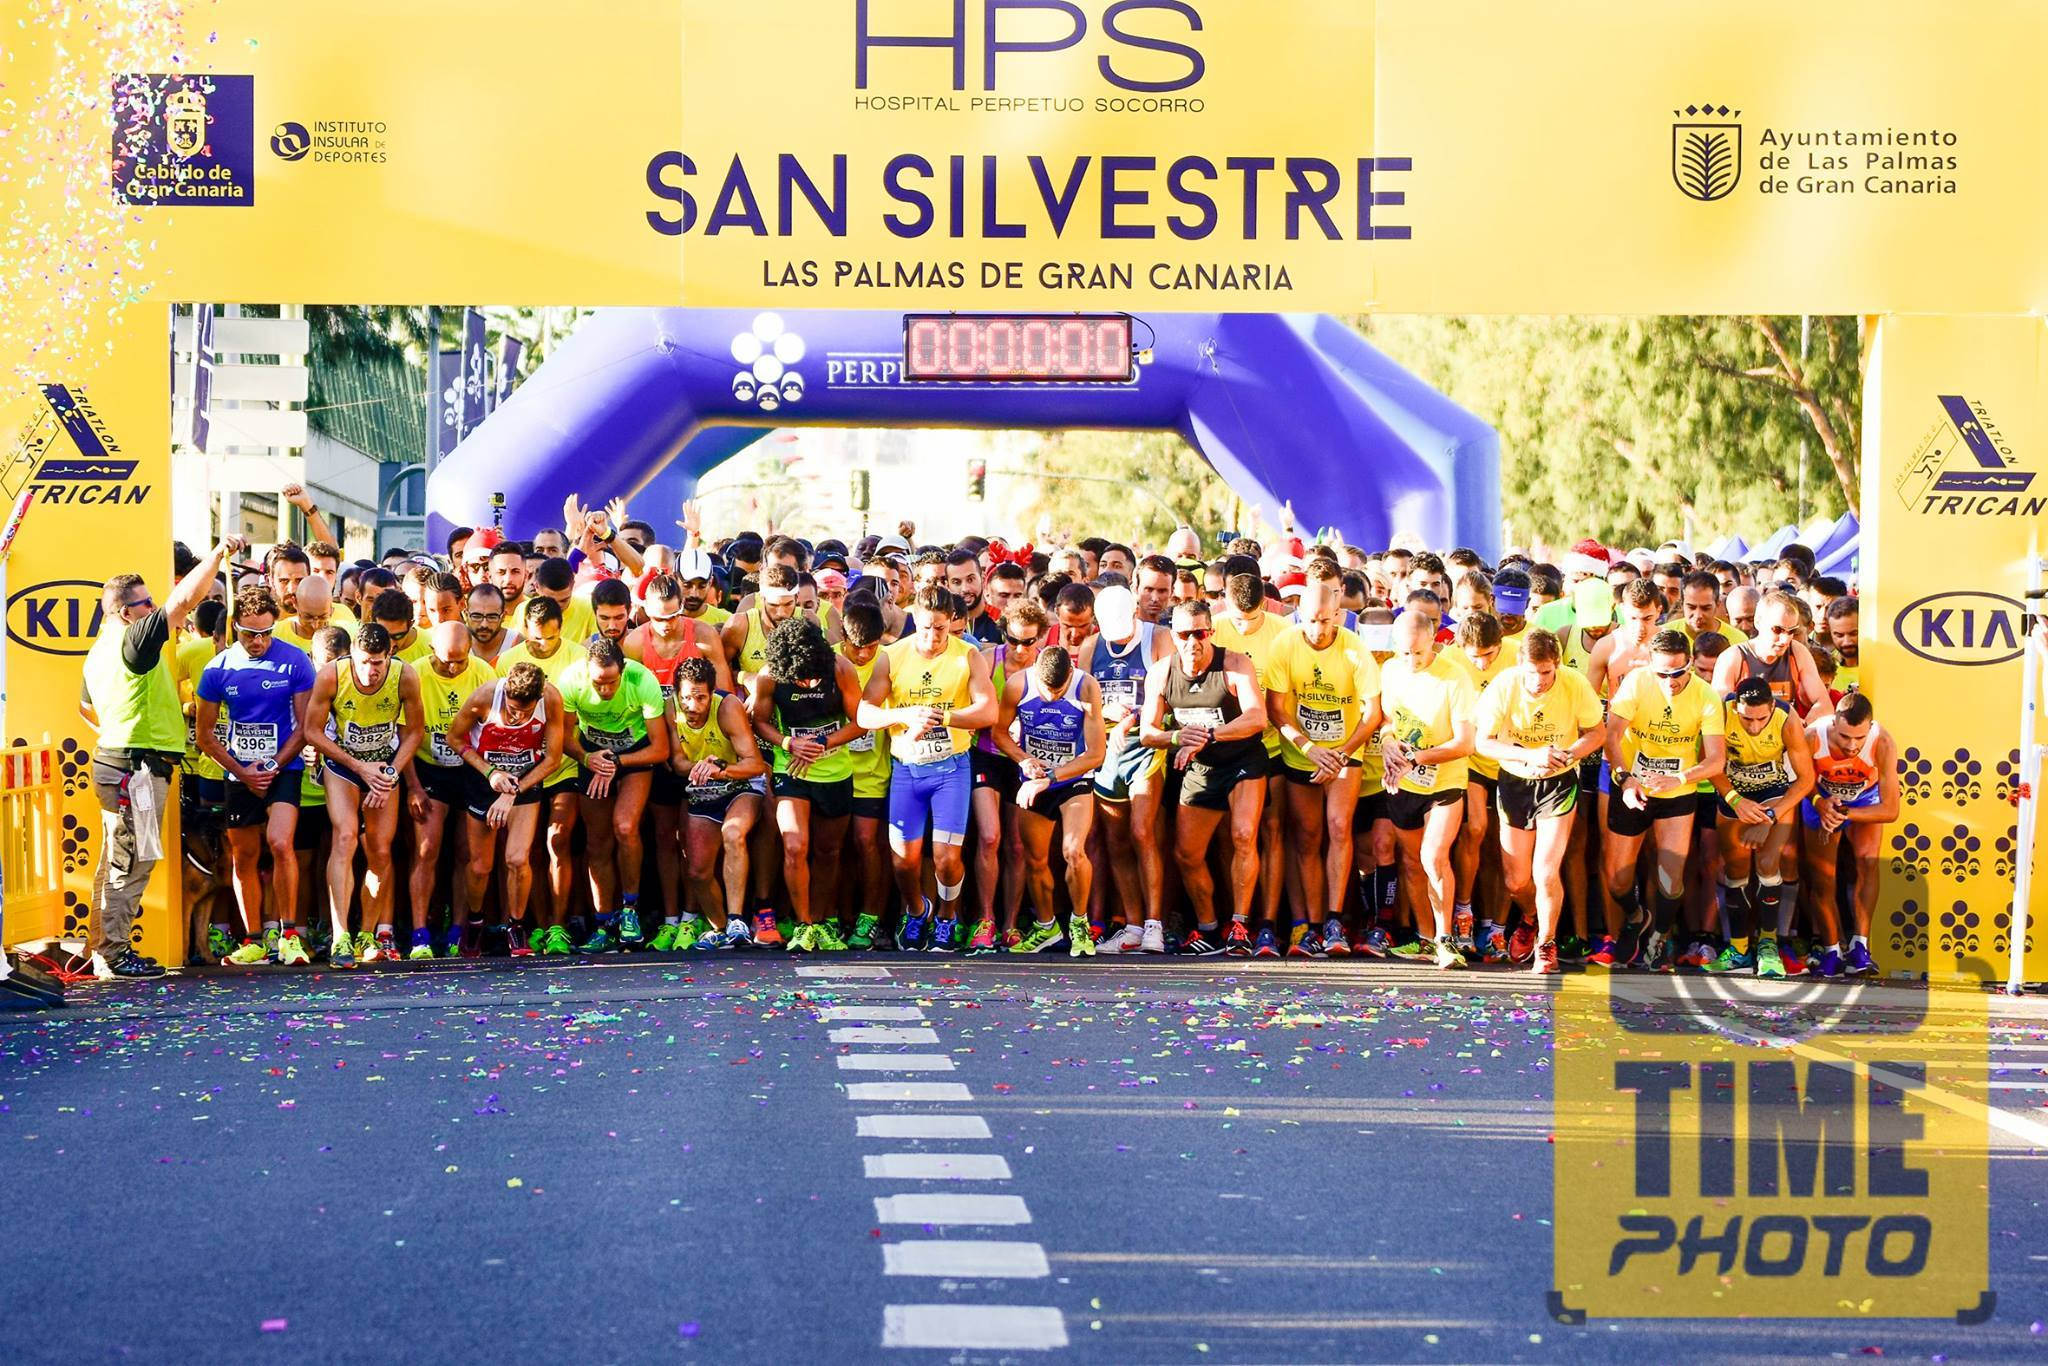 HPS San Silvestre